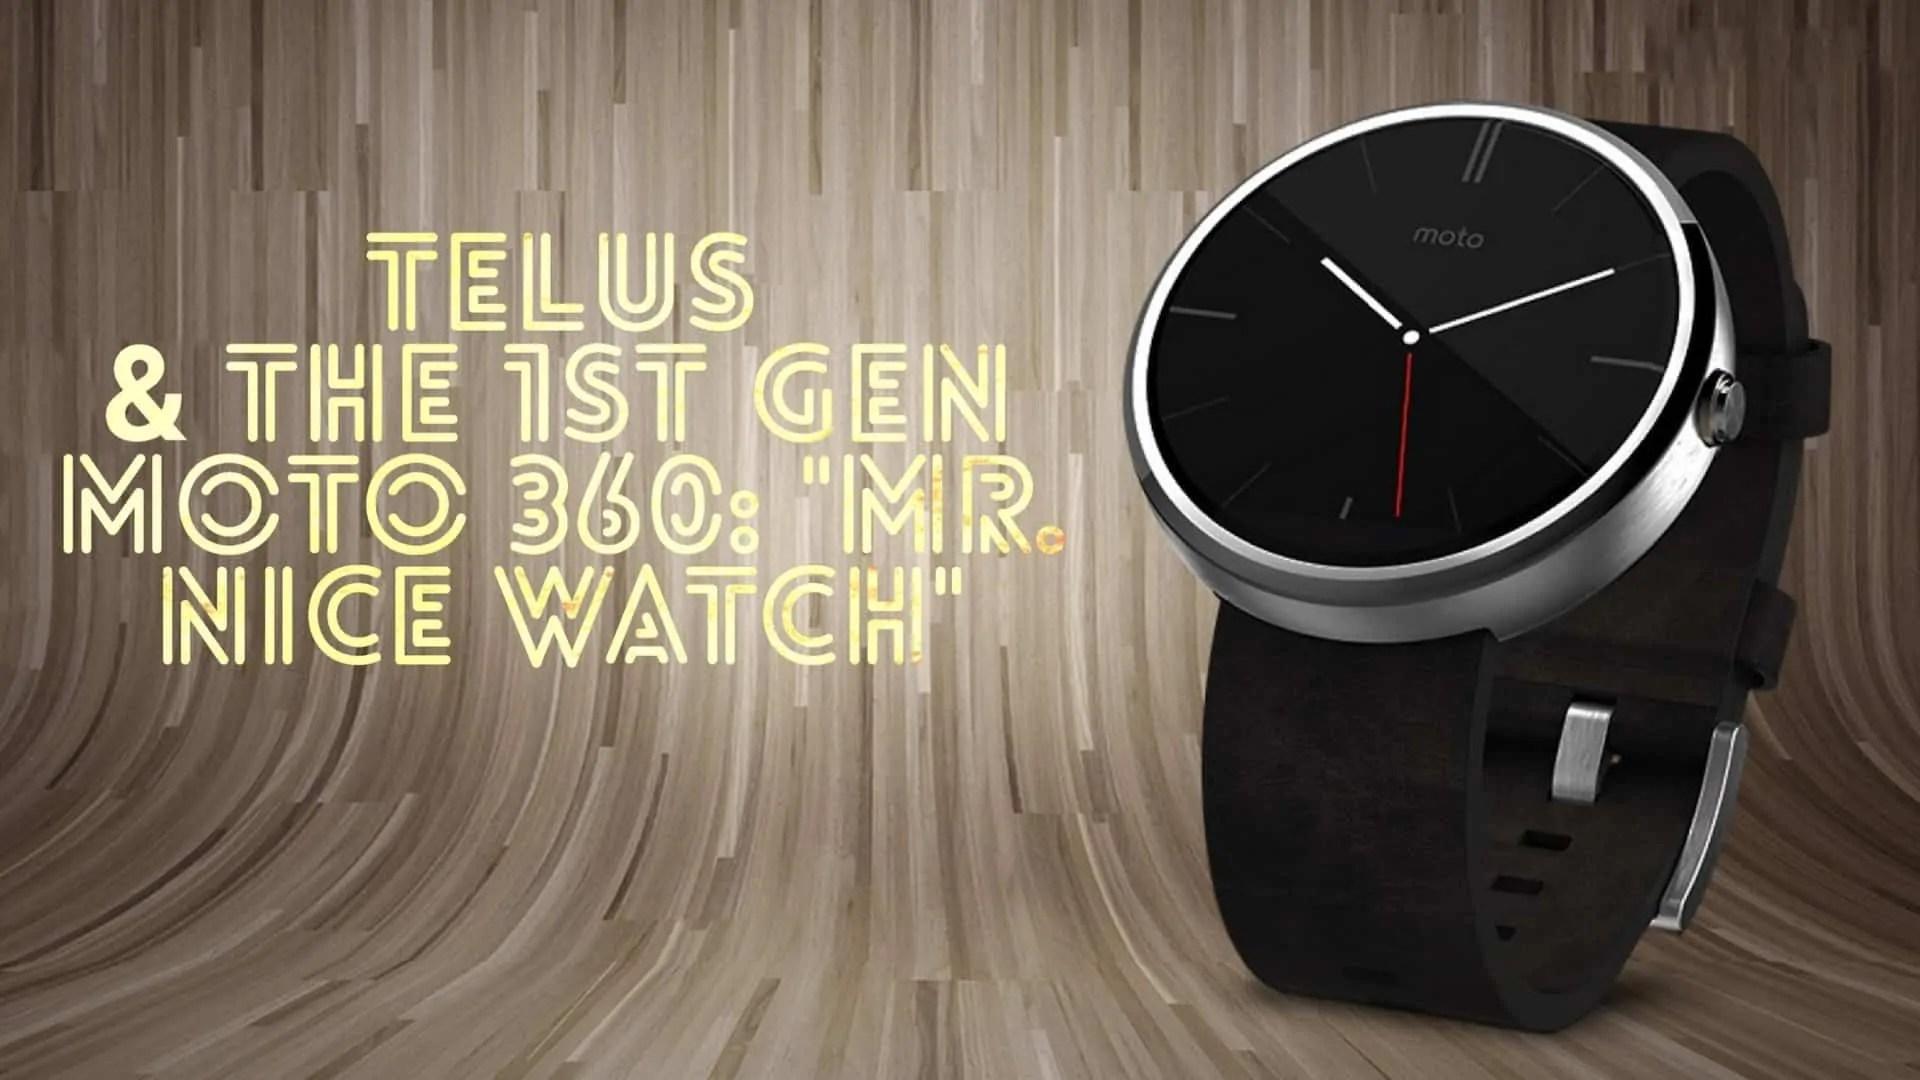 DADDY'S GOT A BRAND NEW TOY- TELUS x The 1st Gen Moto 360 — -Mr. Nice Watch- (Featured Image)